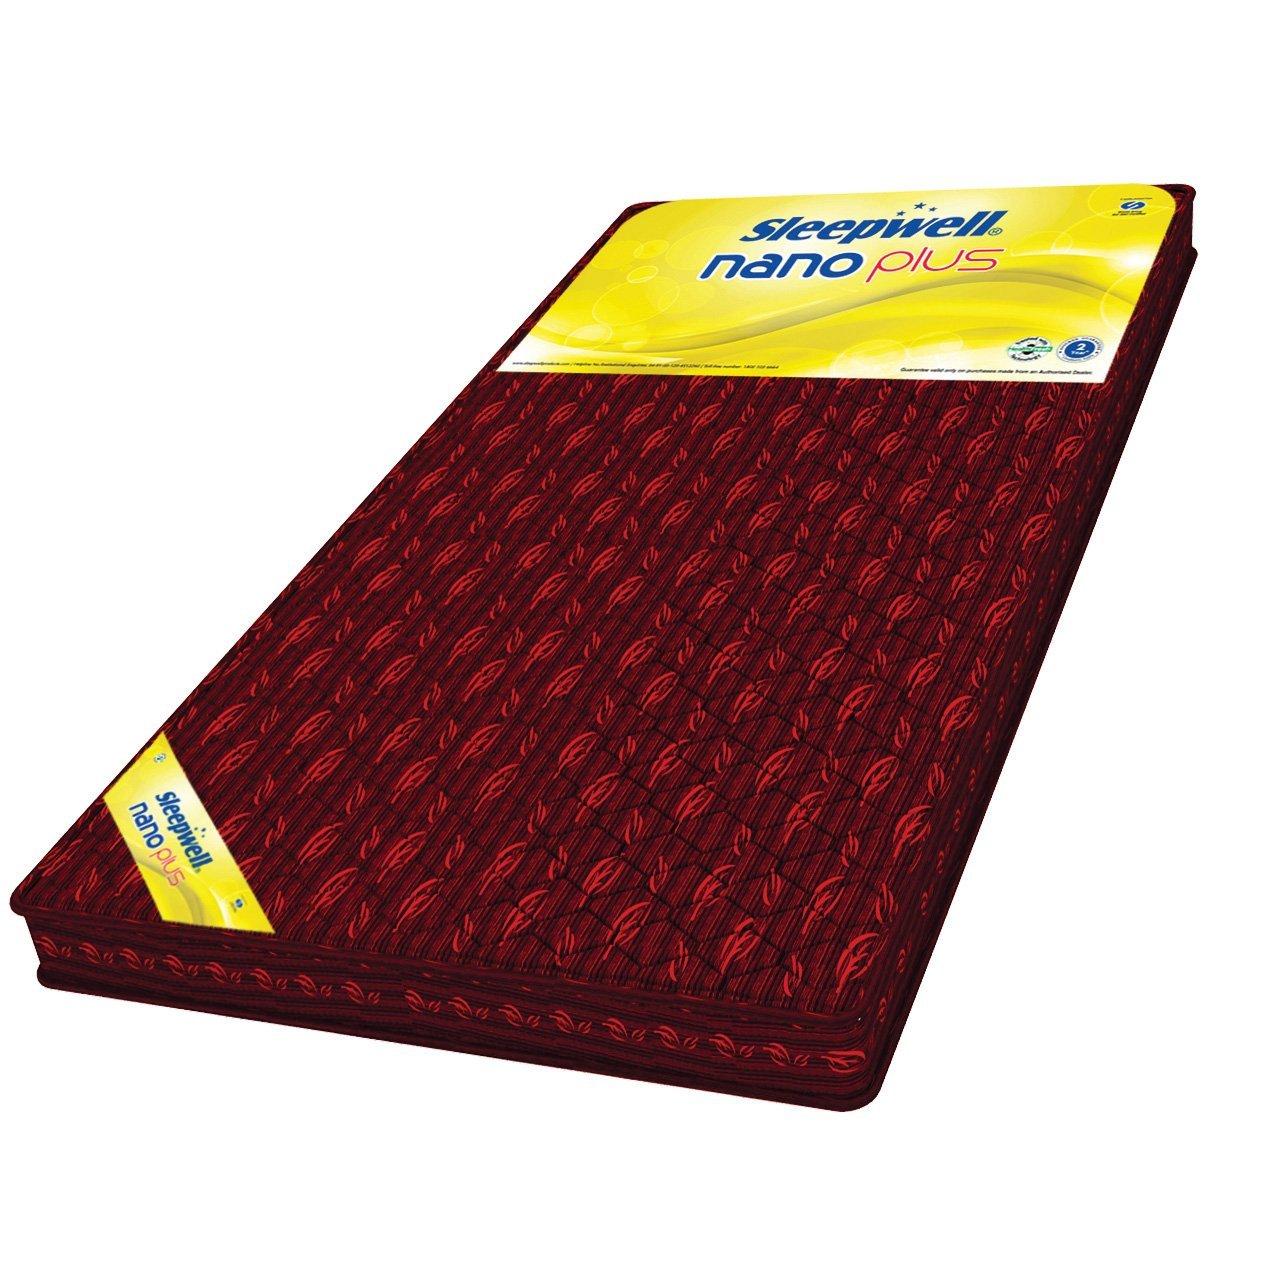 sleepwell nano plus 3 inch single size coir mattress maroon